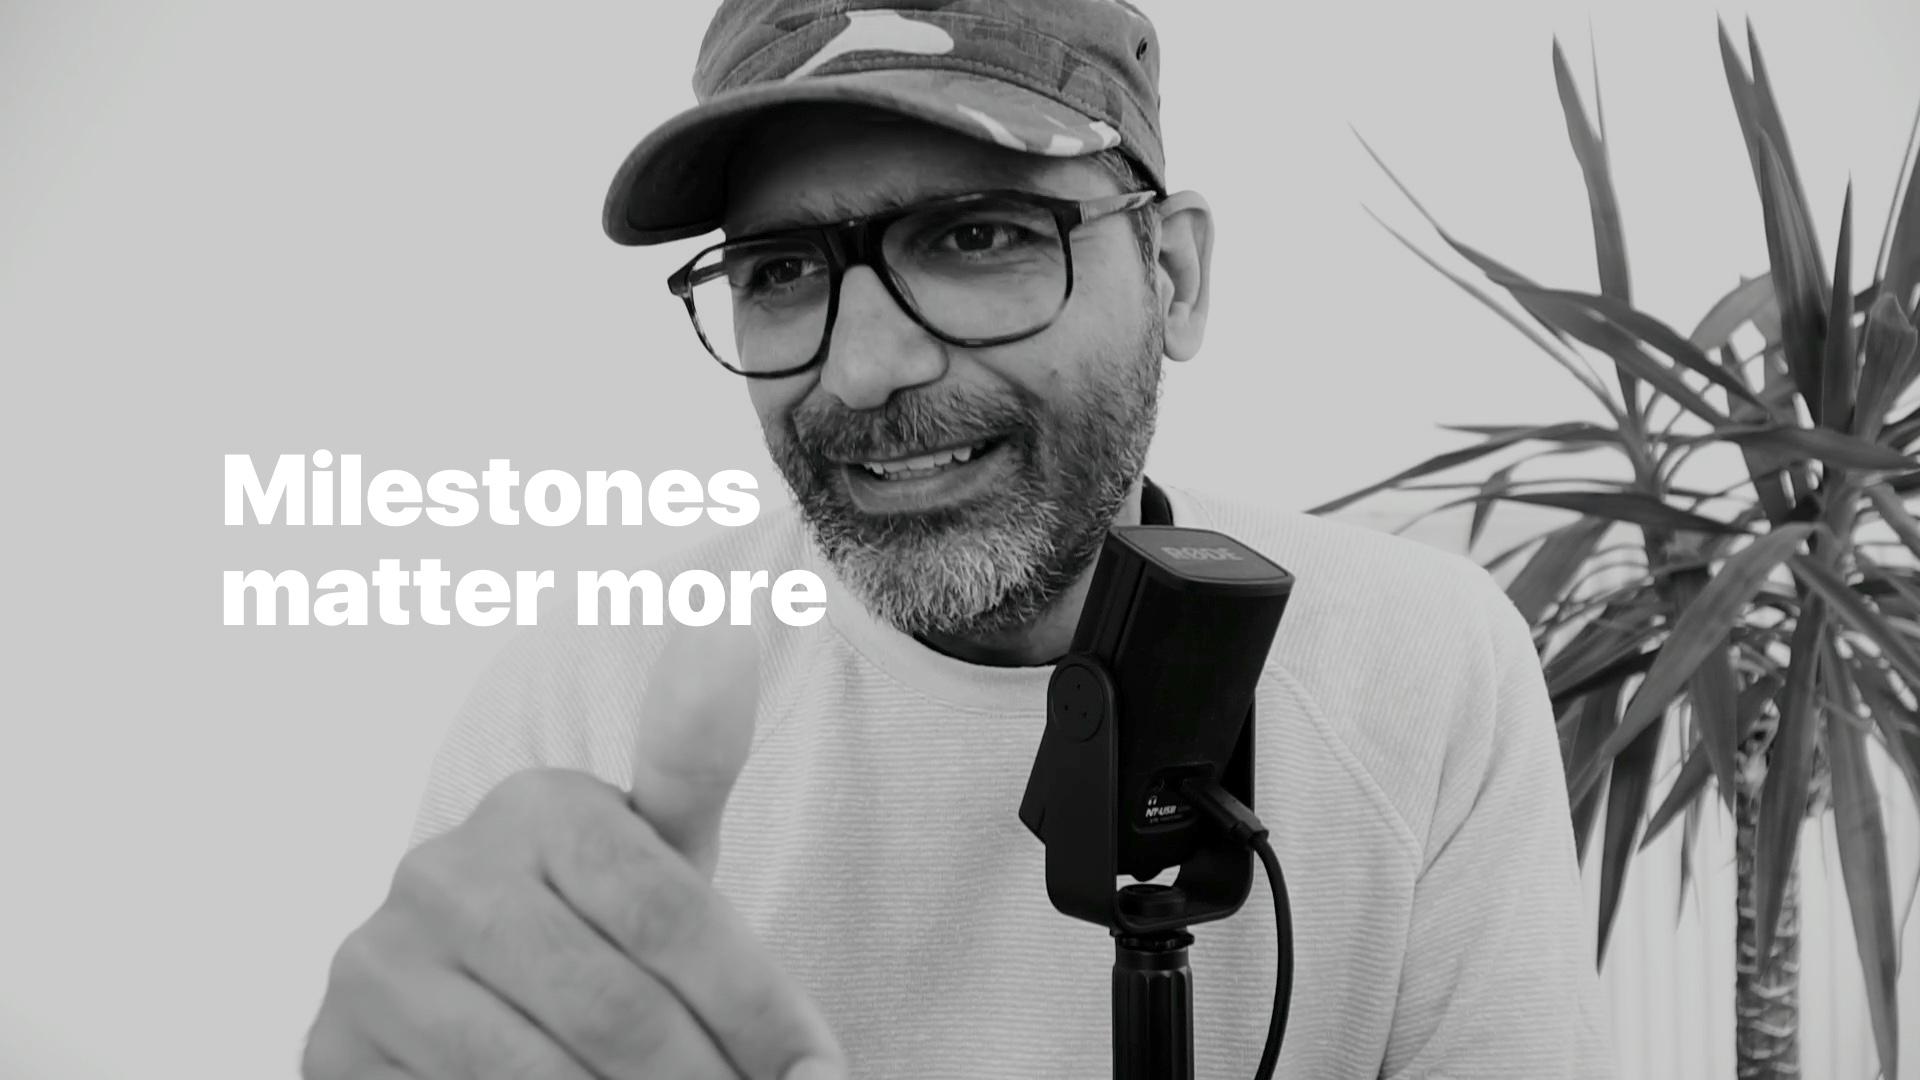 Milestones matter more